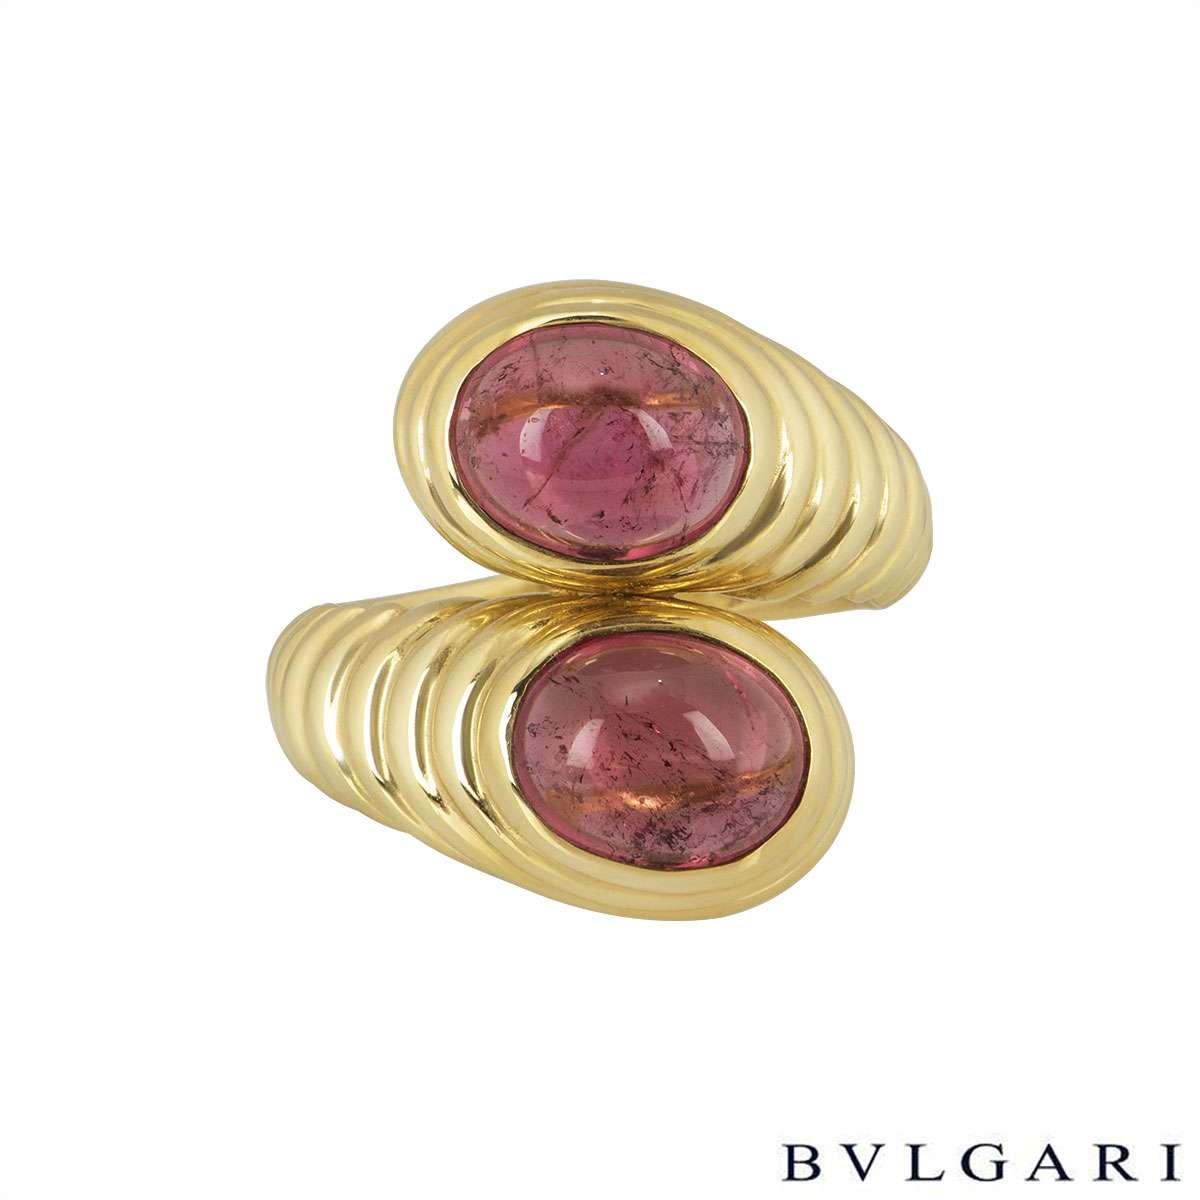 Bvlgari 18k Yellow Gold Amethyst Dress Ring